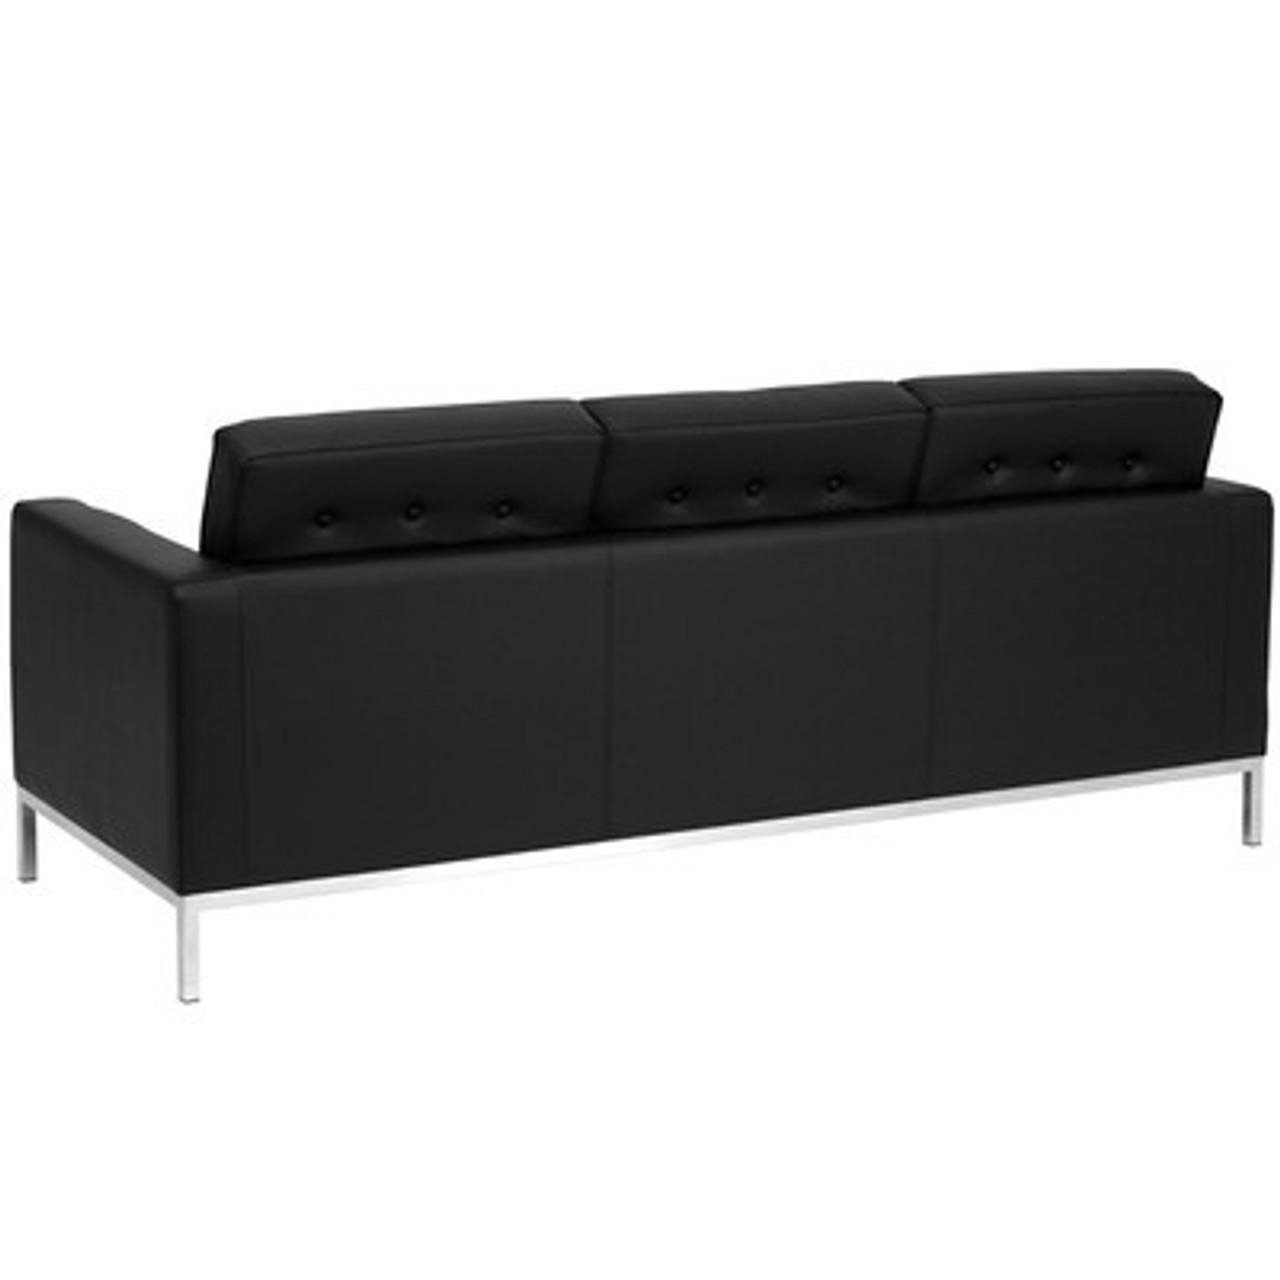 1pc Modern Leather Office Reception Sofa, FF-0441-12